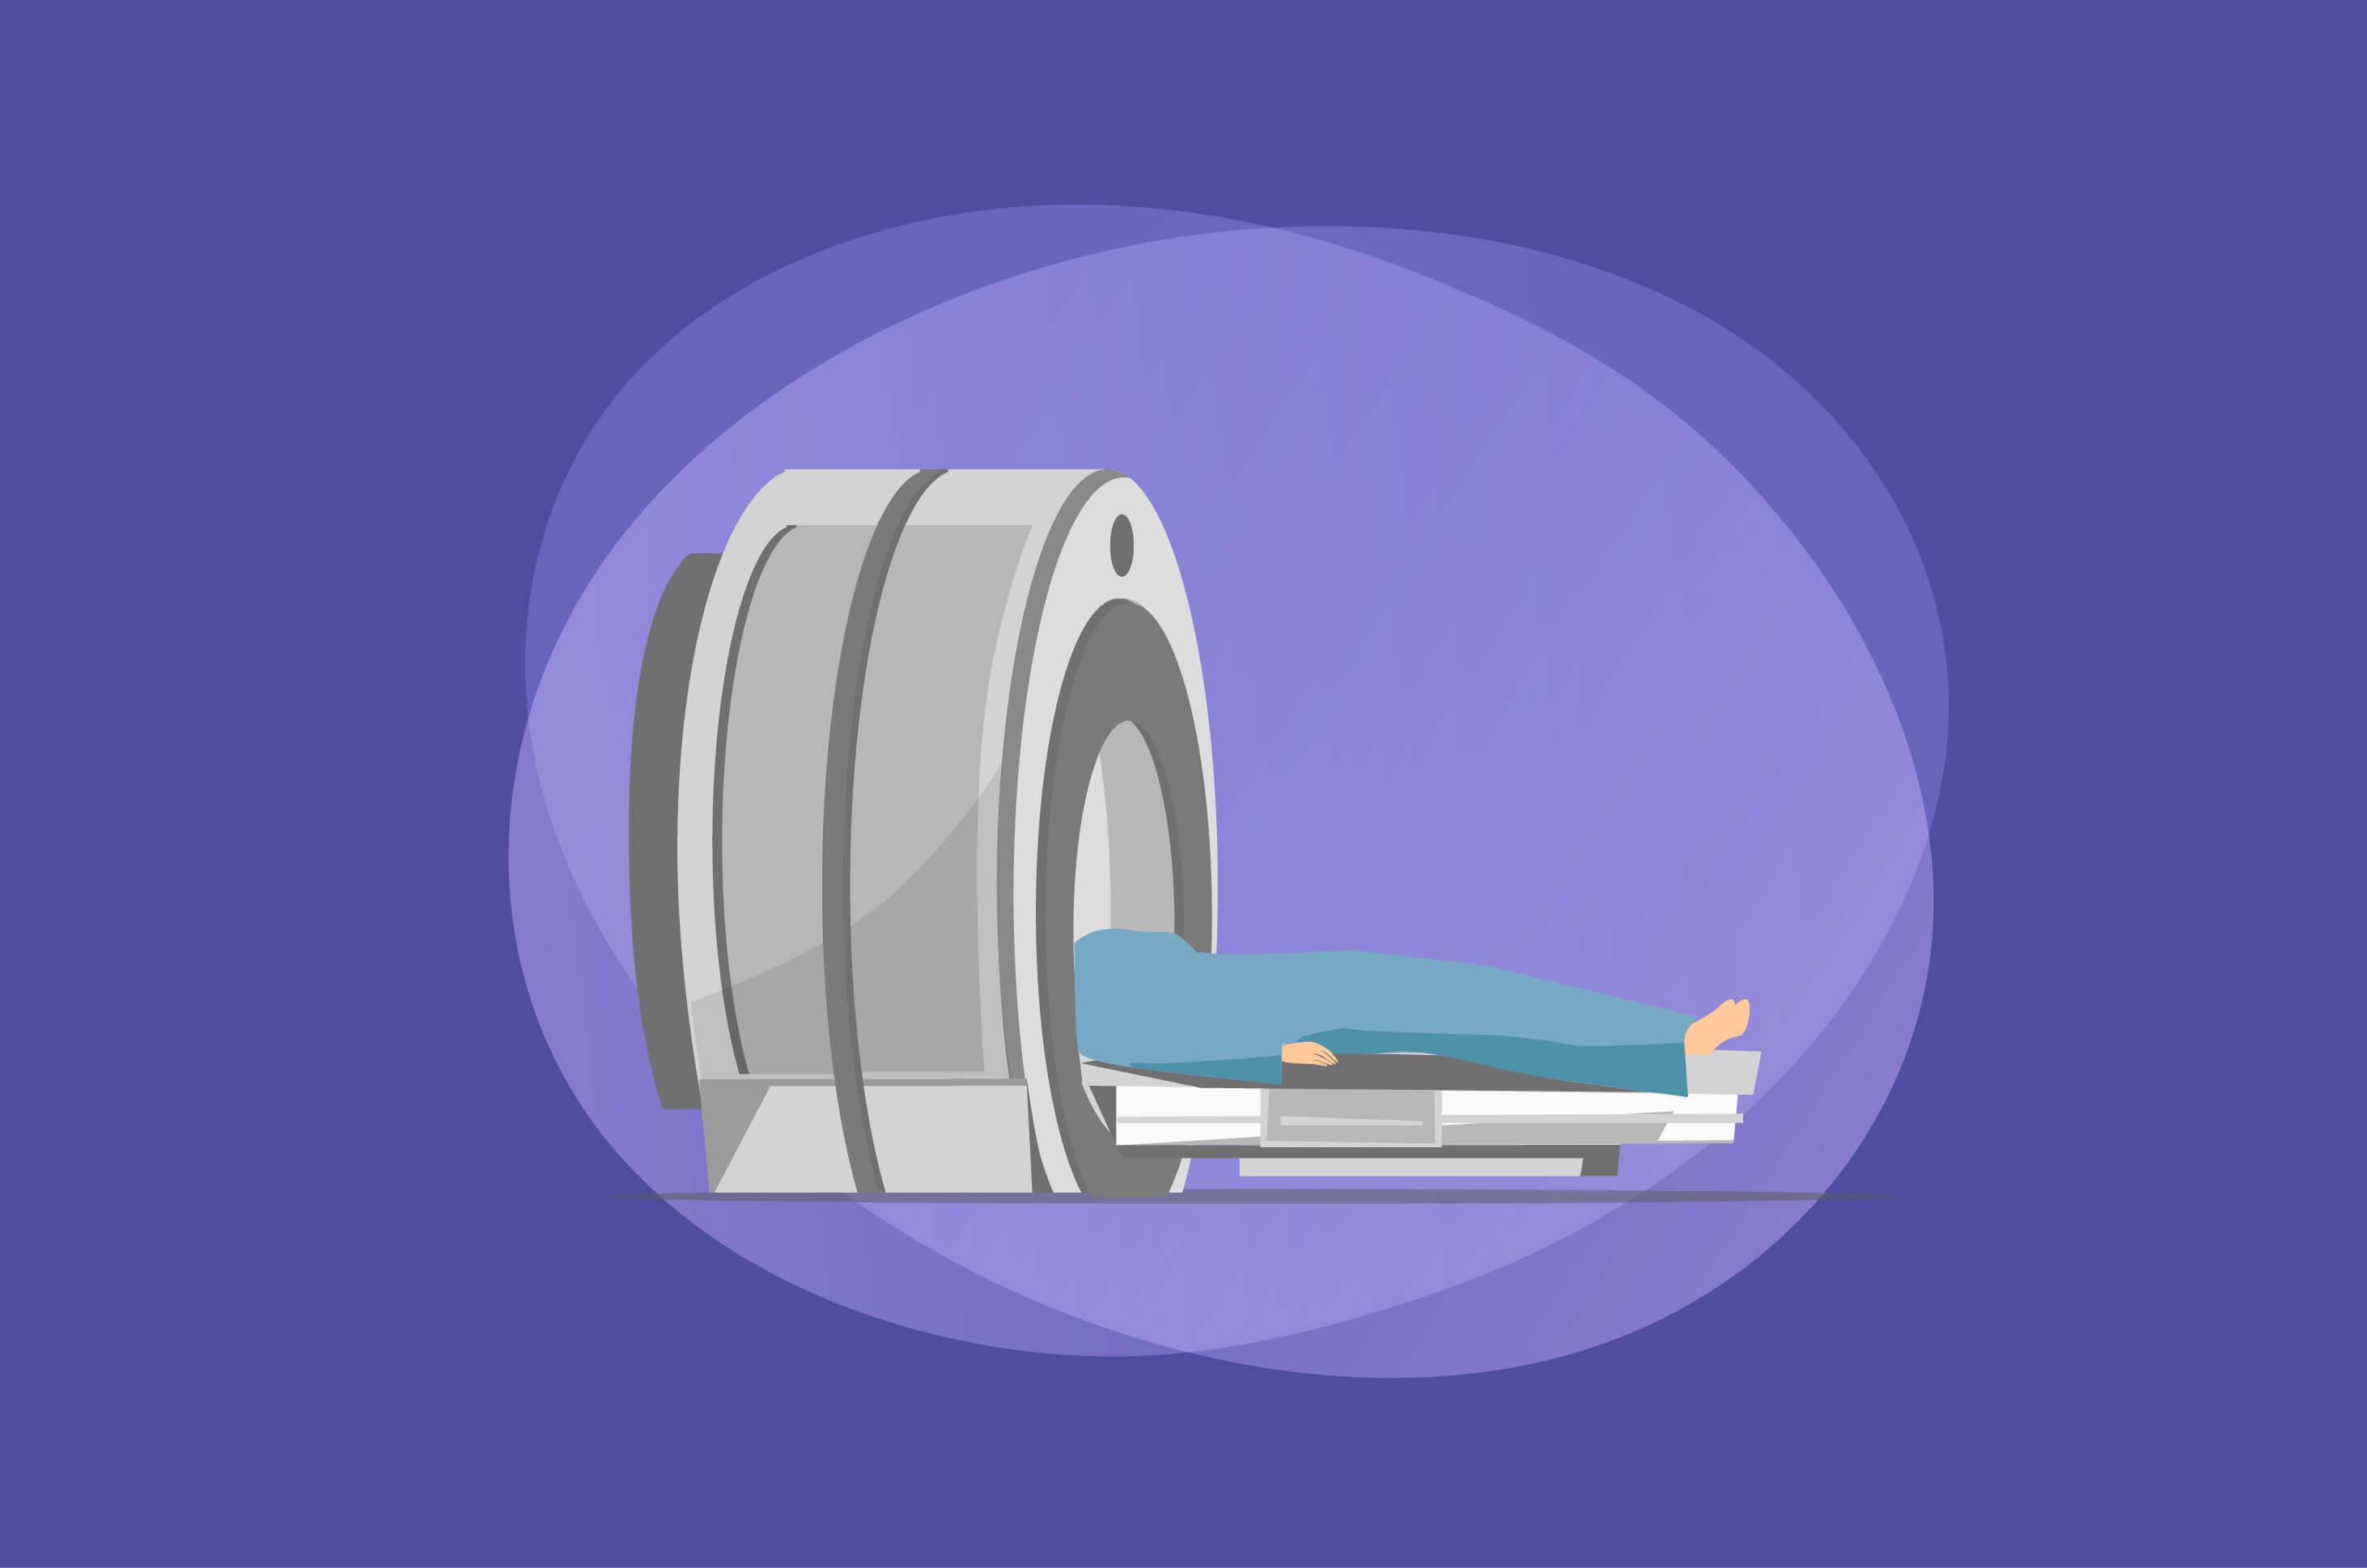 Ketahui Persiapan yang Perlu Dilakukan Sebelum Radiologi